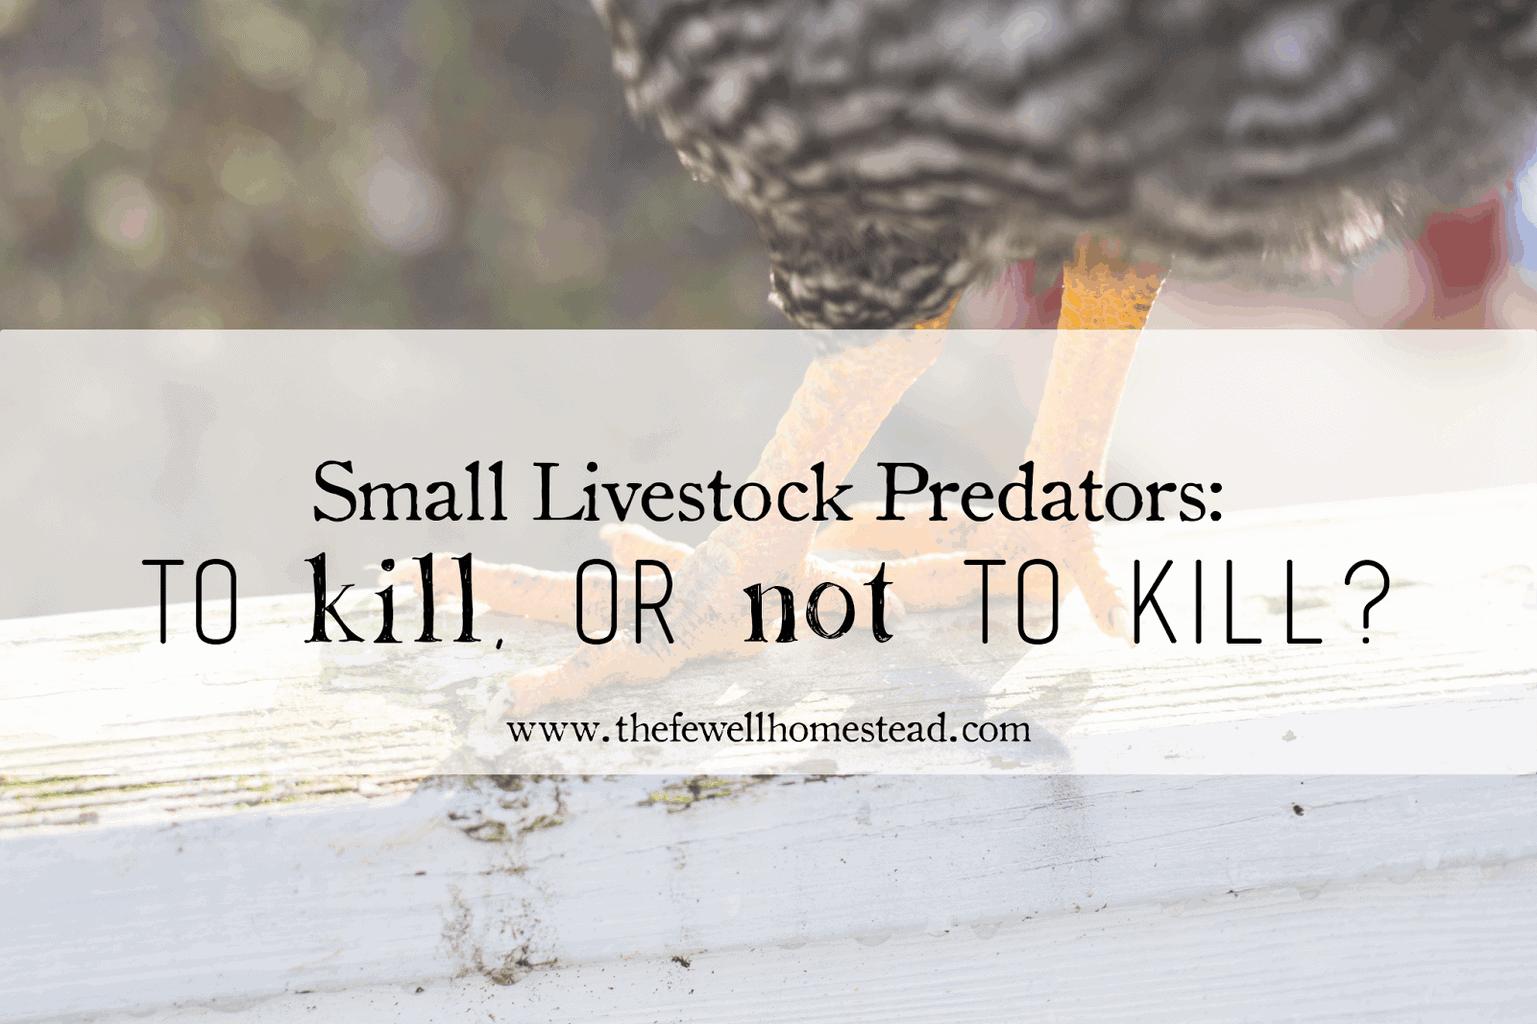 Small Livestock Predators: To kill, or not to kill?